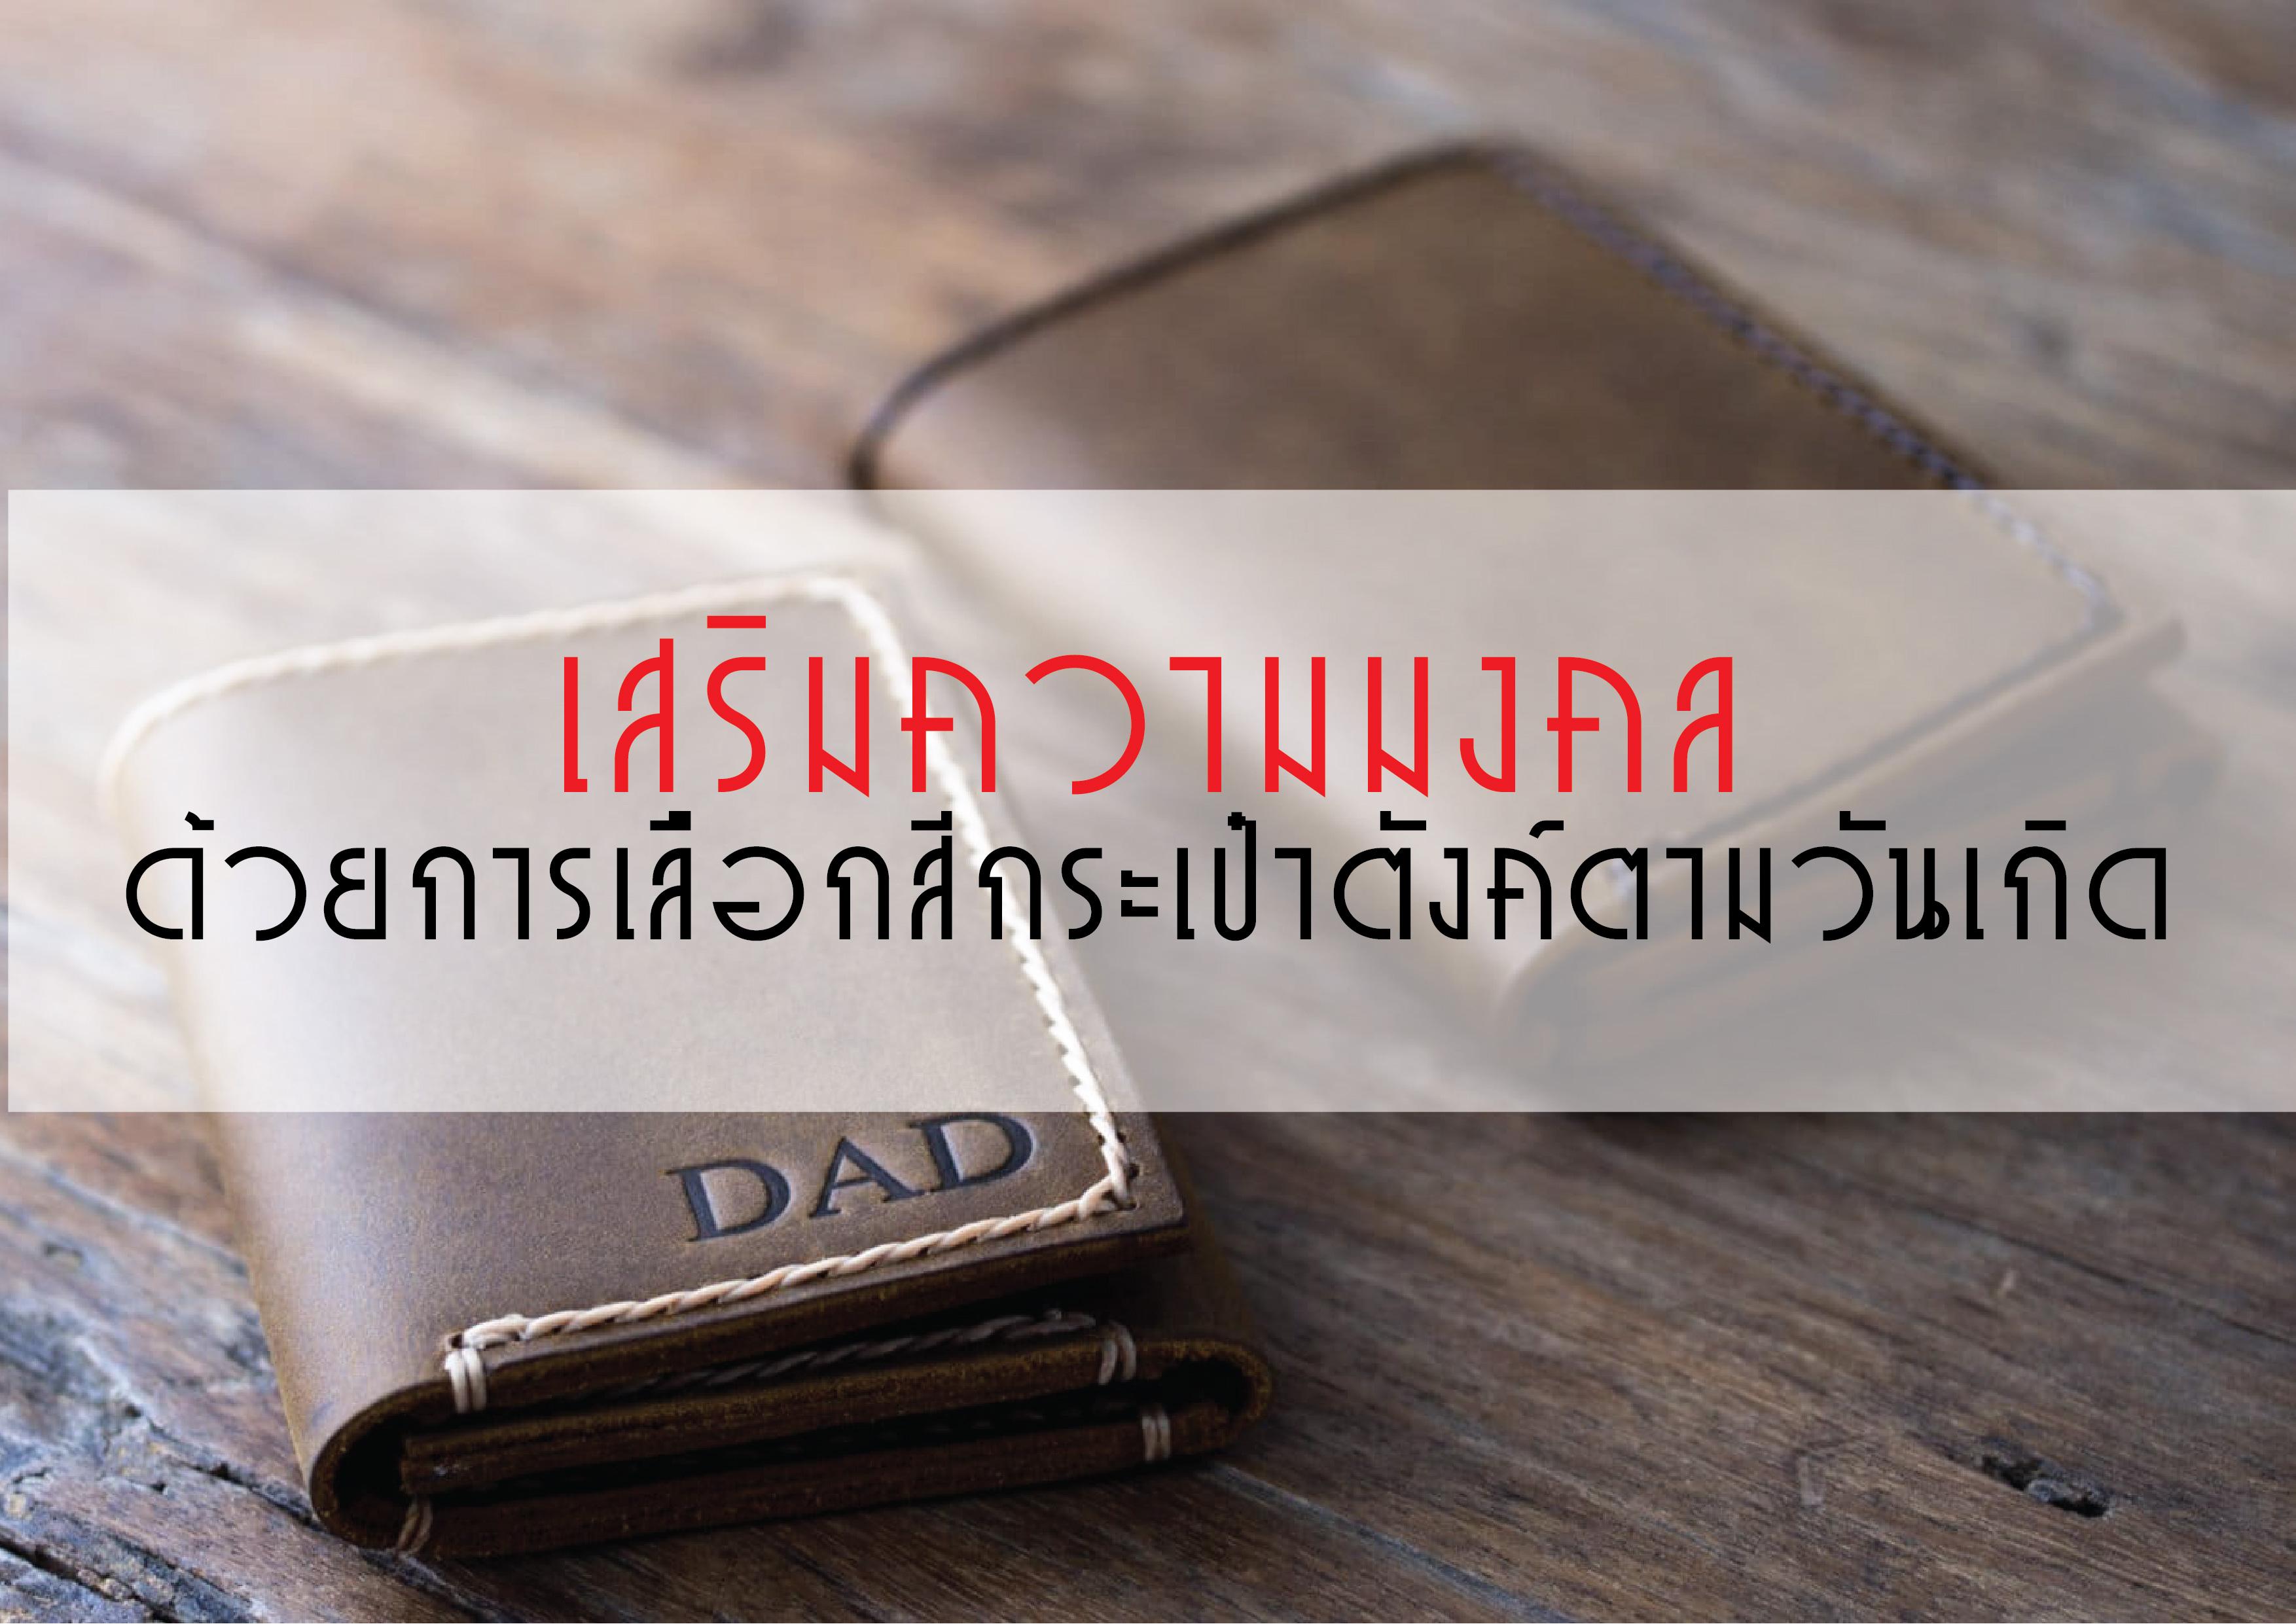 ztaobao :: เสริมความมงคลด้วยเลือกสีกระเป๋าตังค์ตามวันเกิด